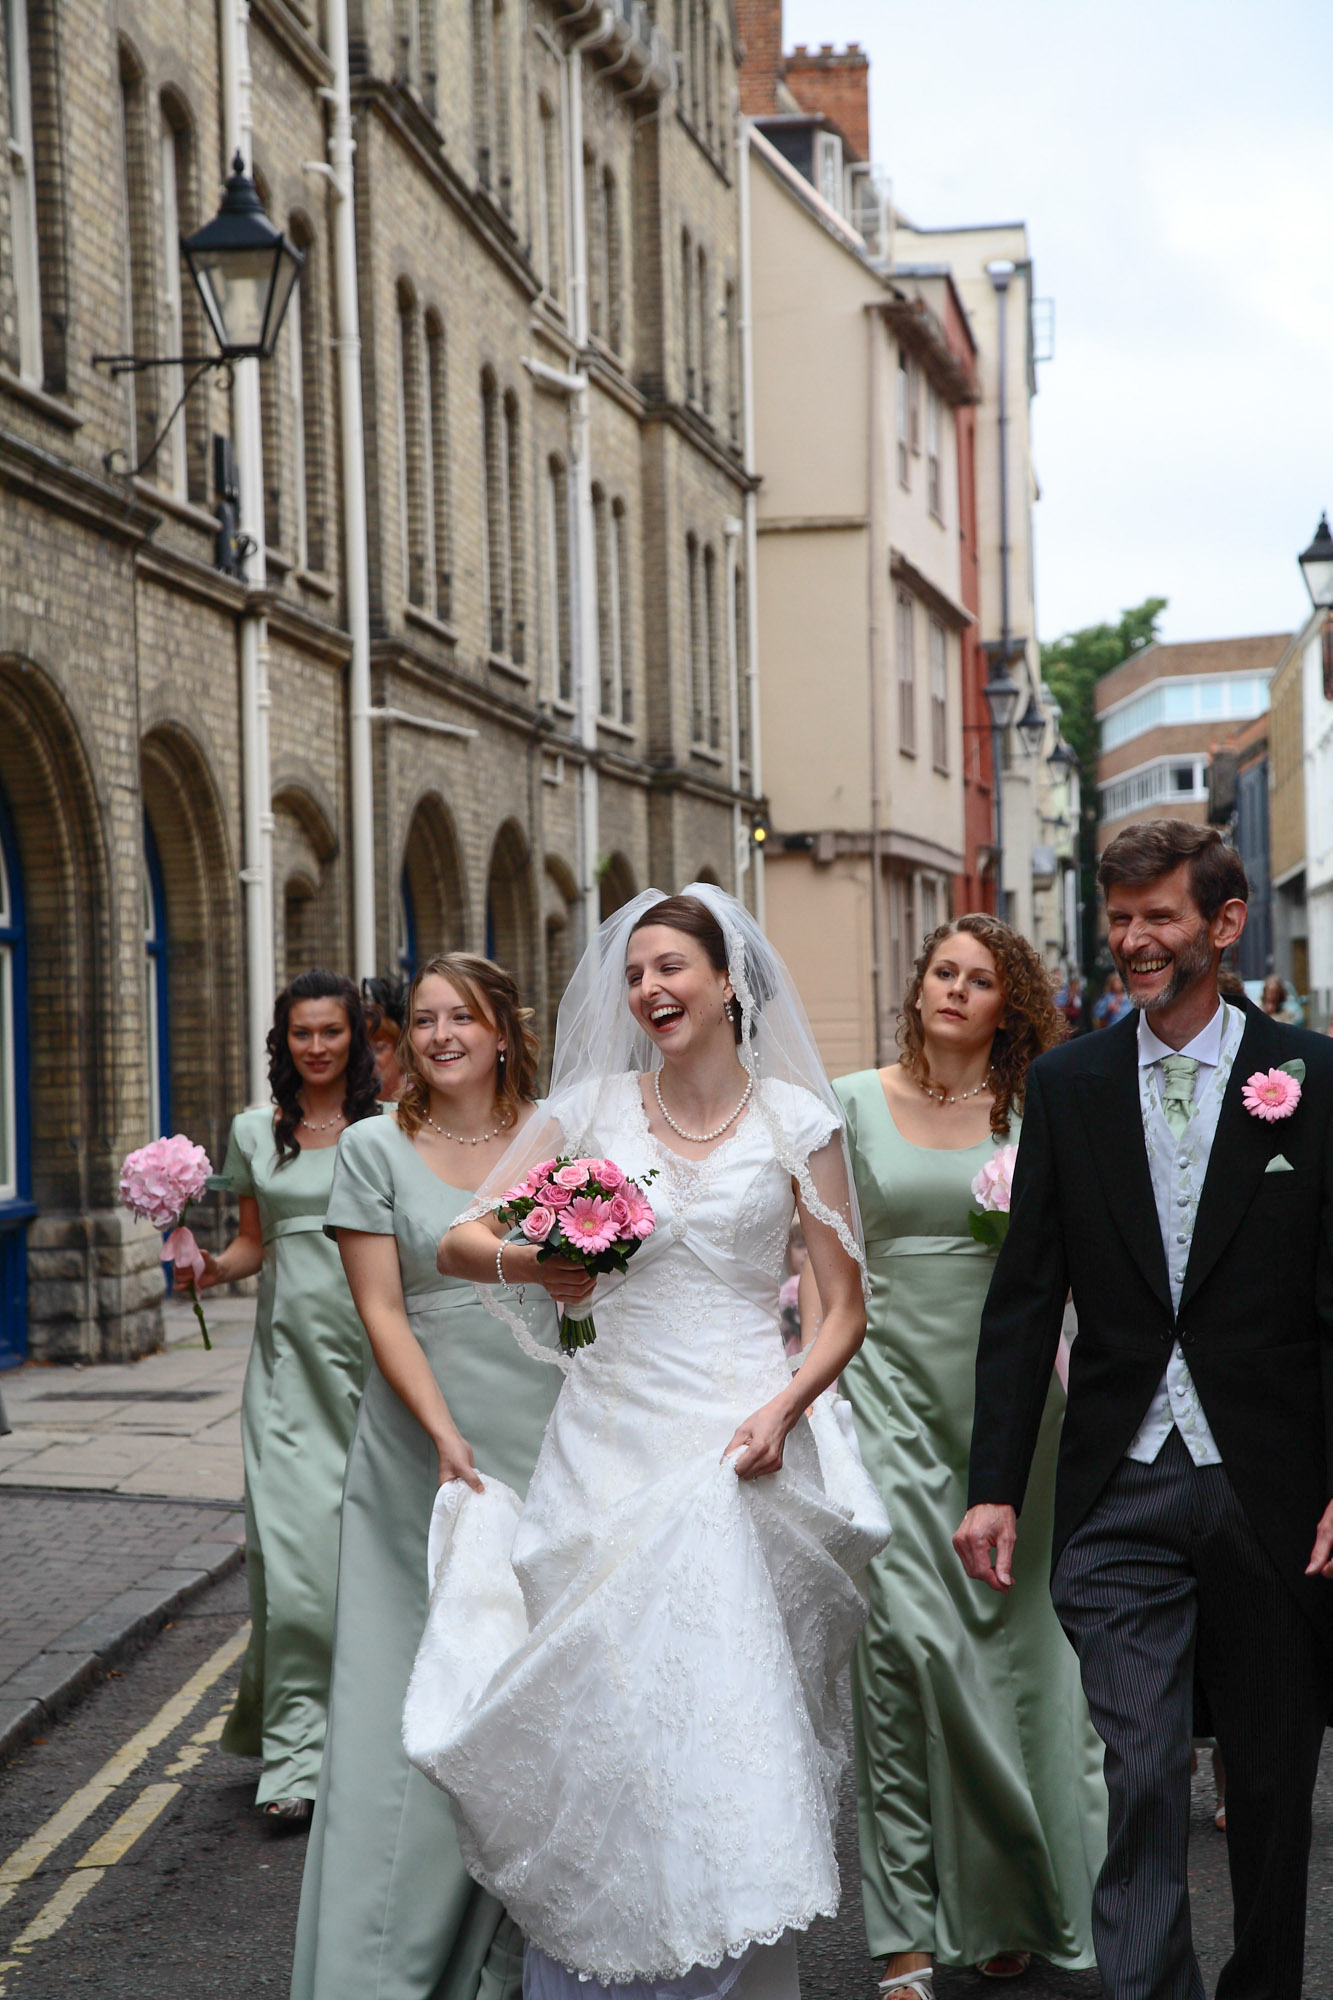 weddings-couples-love-photographer-oxford-london-jonathan-self-photography-17.jpg